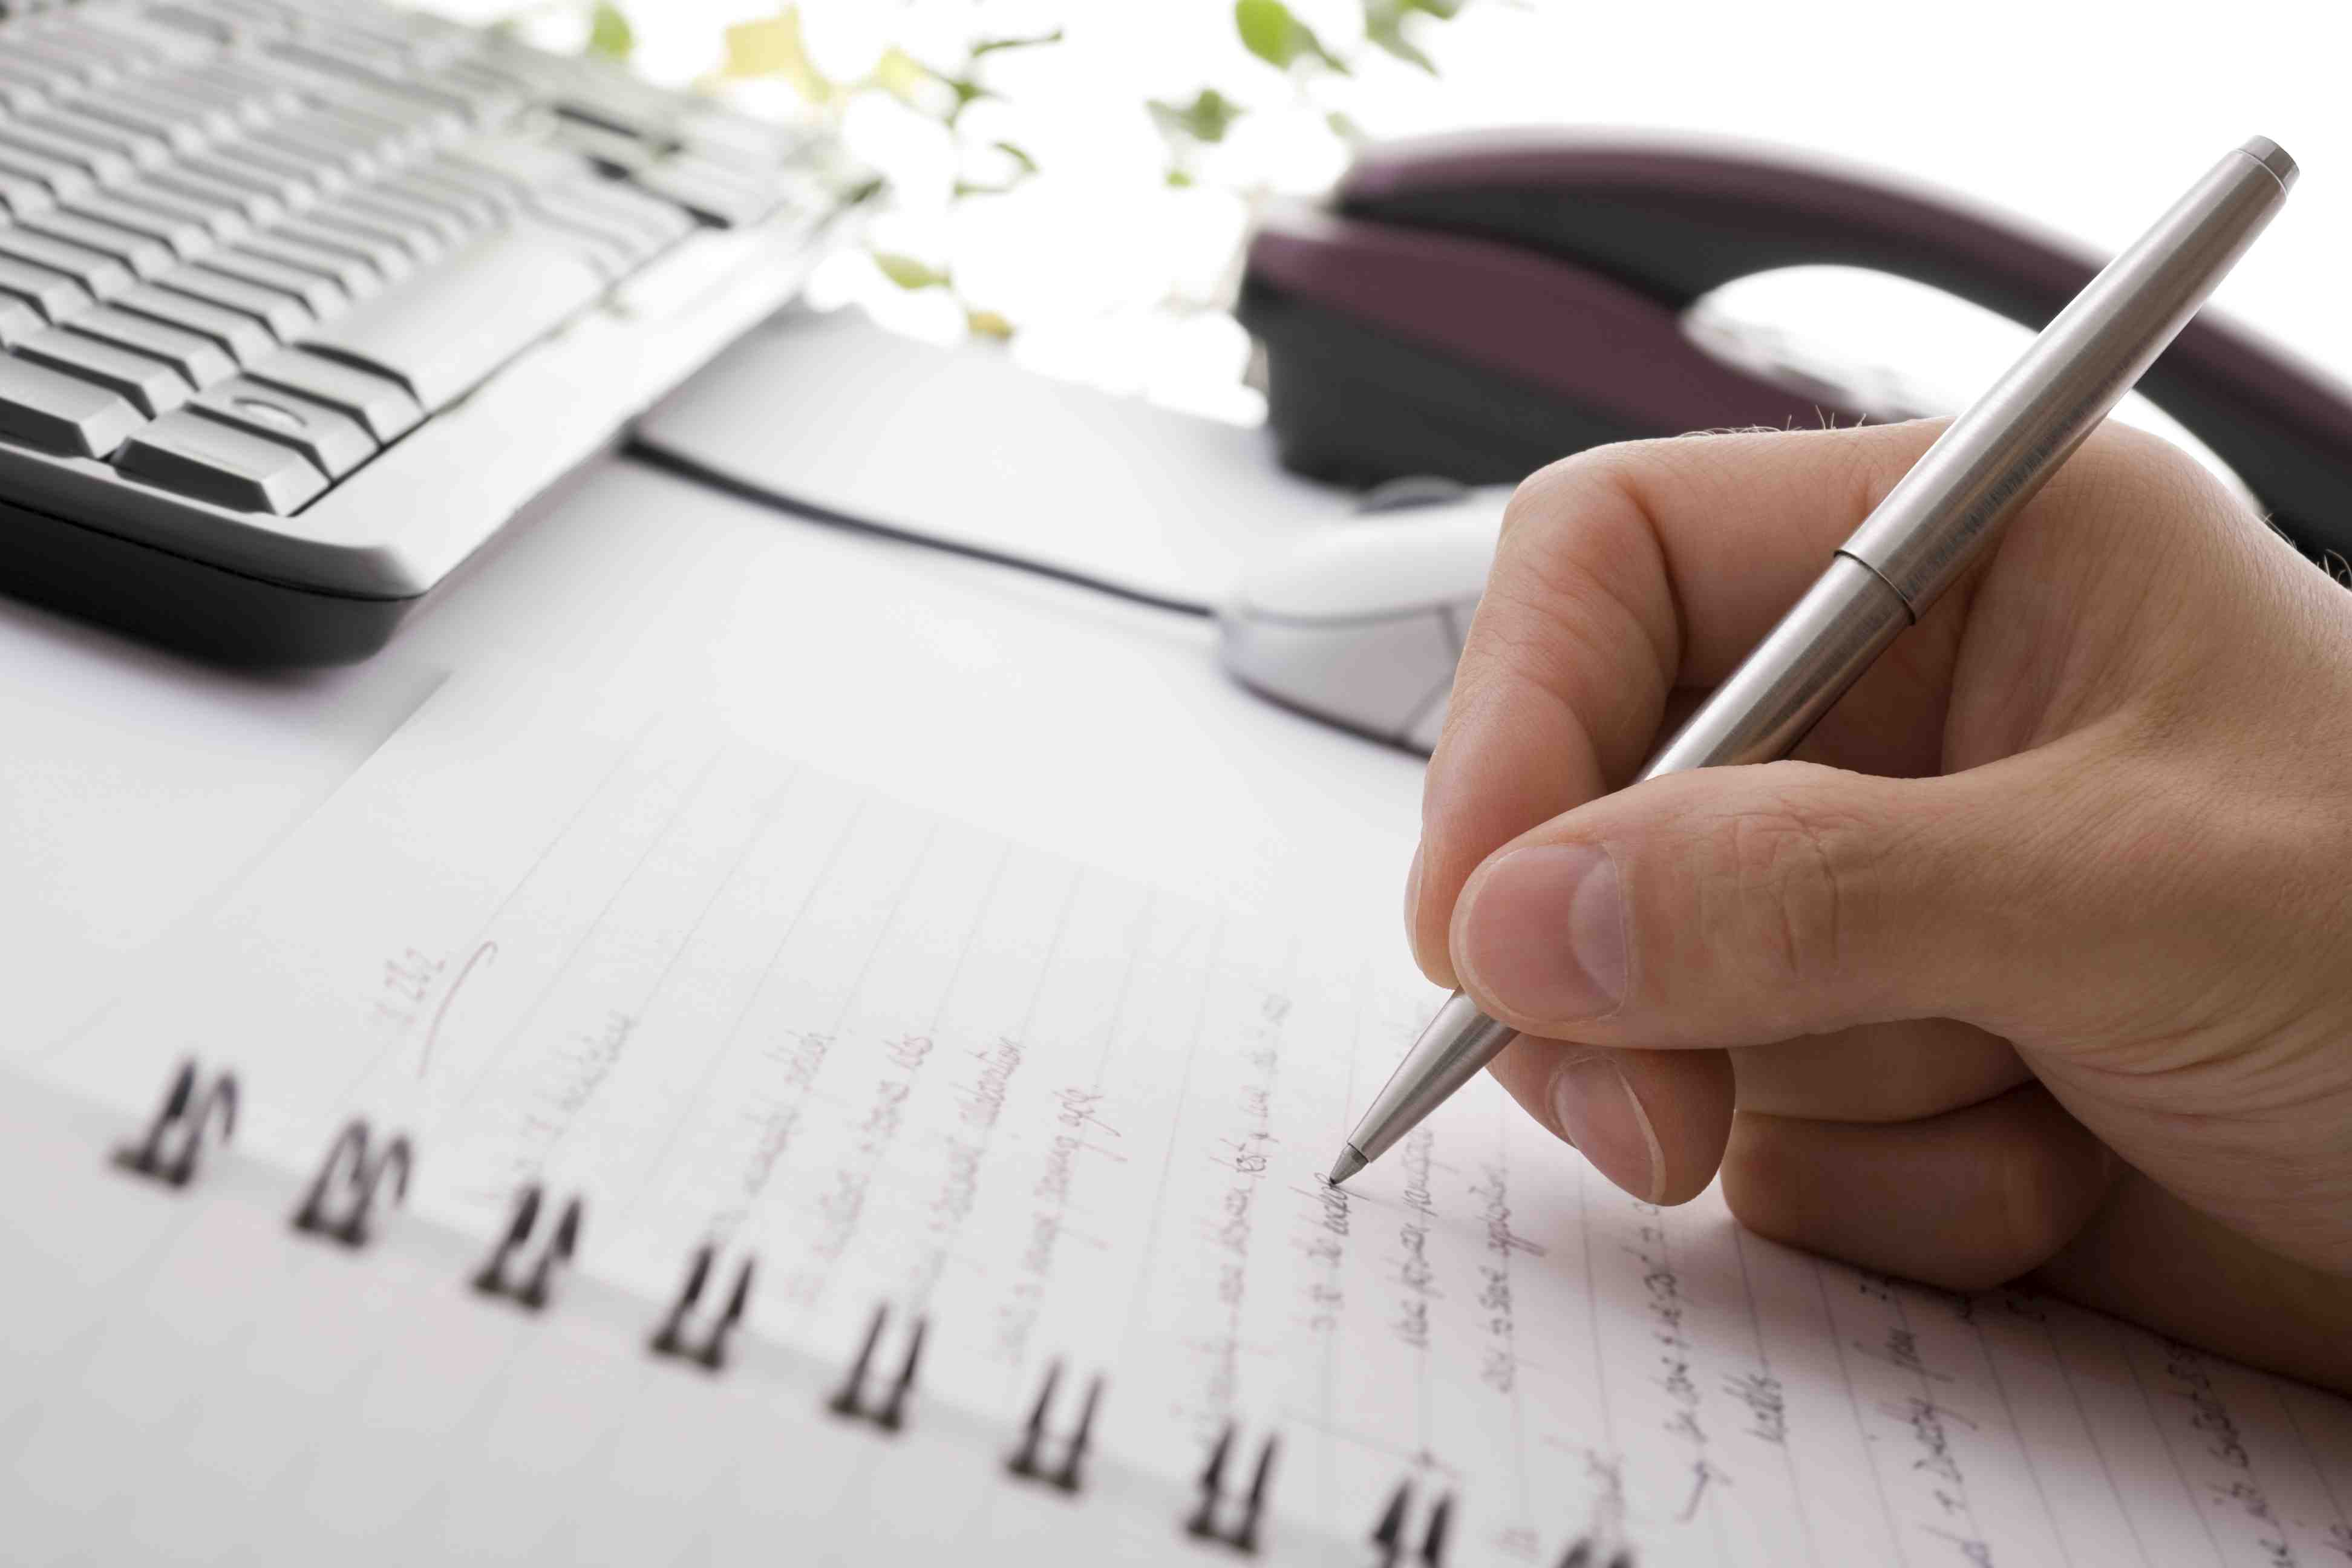 methods to improve creative writing